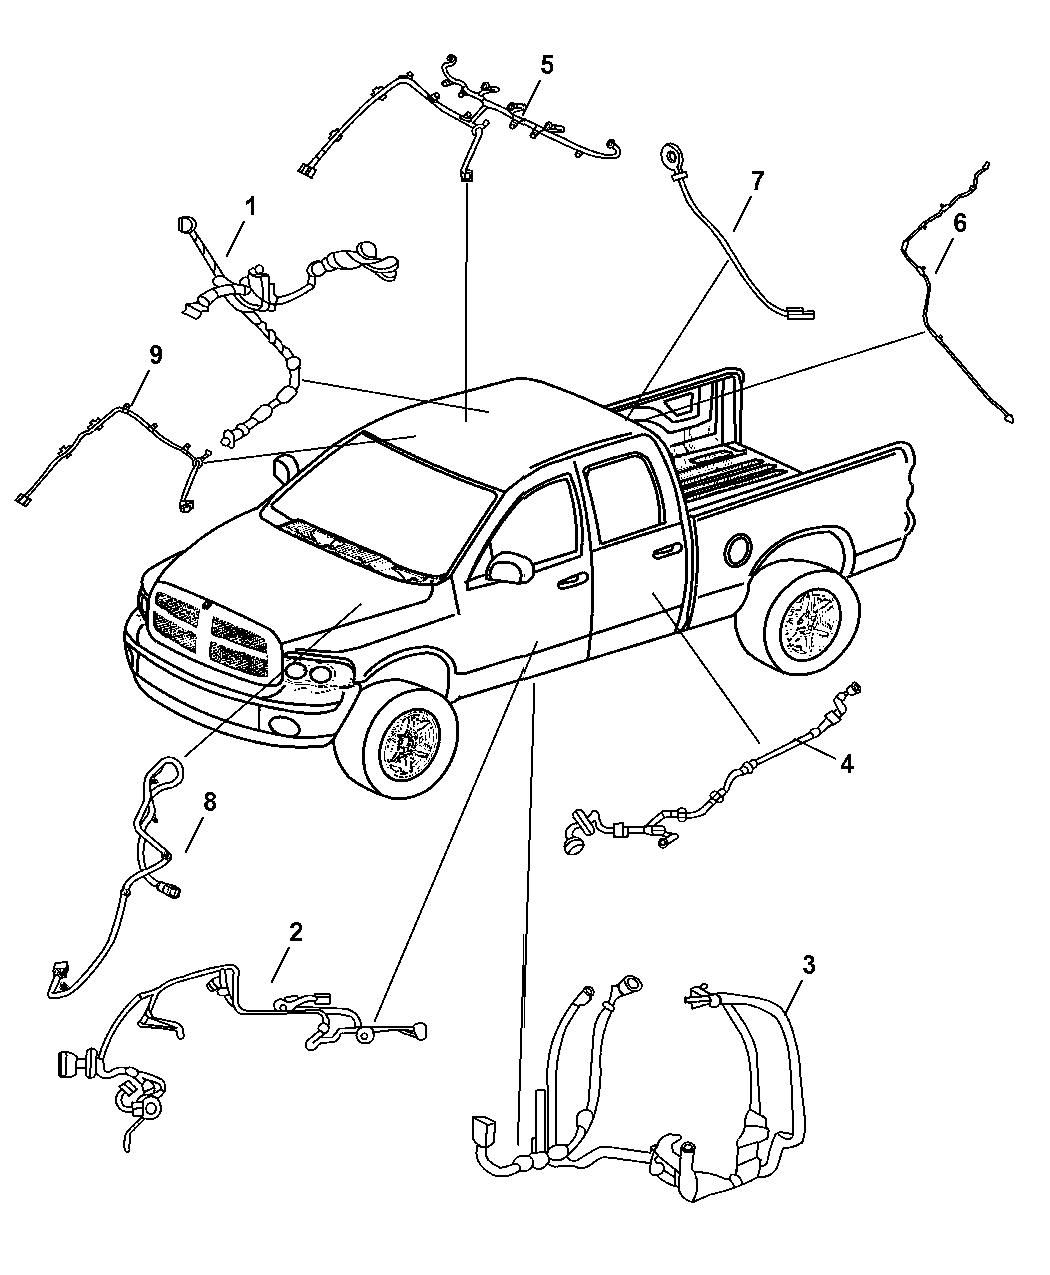 Resource T D Amp S L Amp R Ab C Ee Cd F Be Fbb B B B C Cebc Cac Ebe Cfd Db on Dodge Ram Overhead Console Wiring Diagram